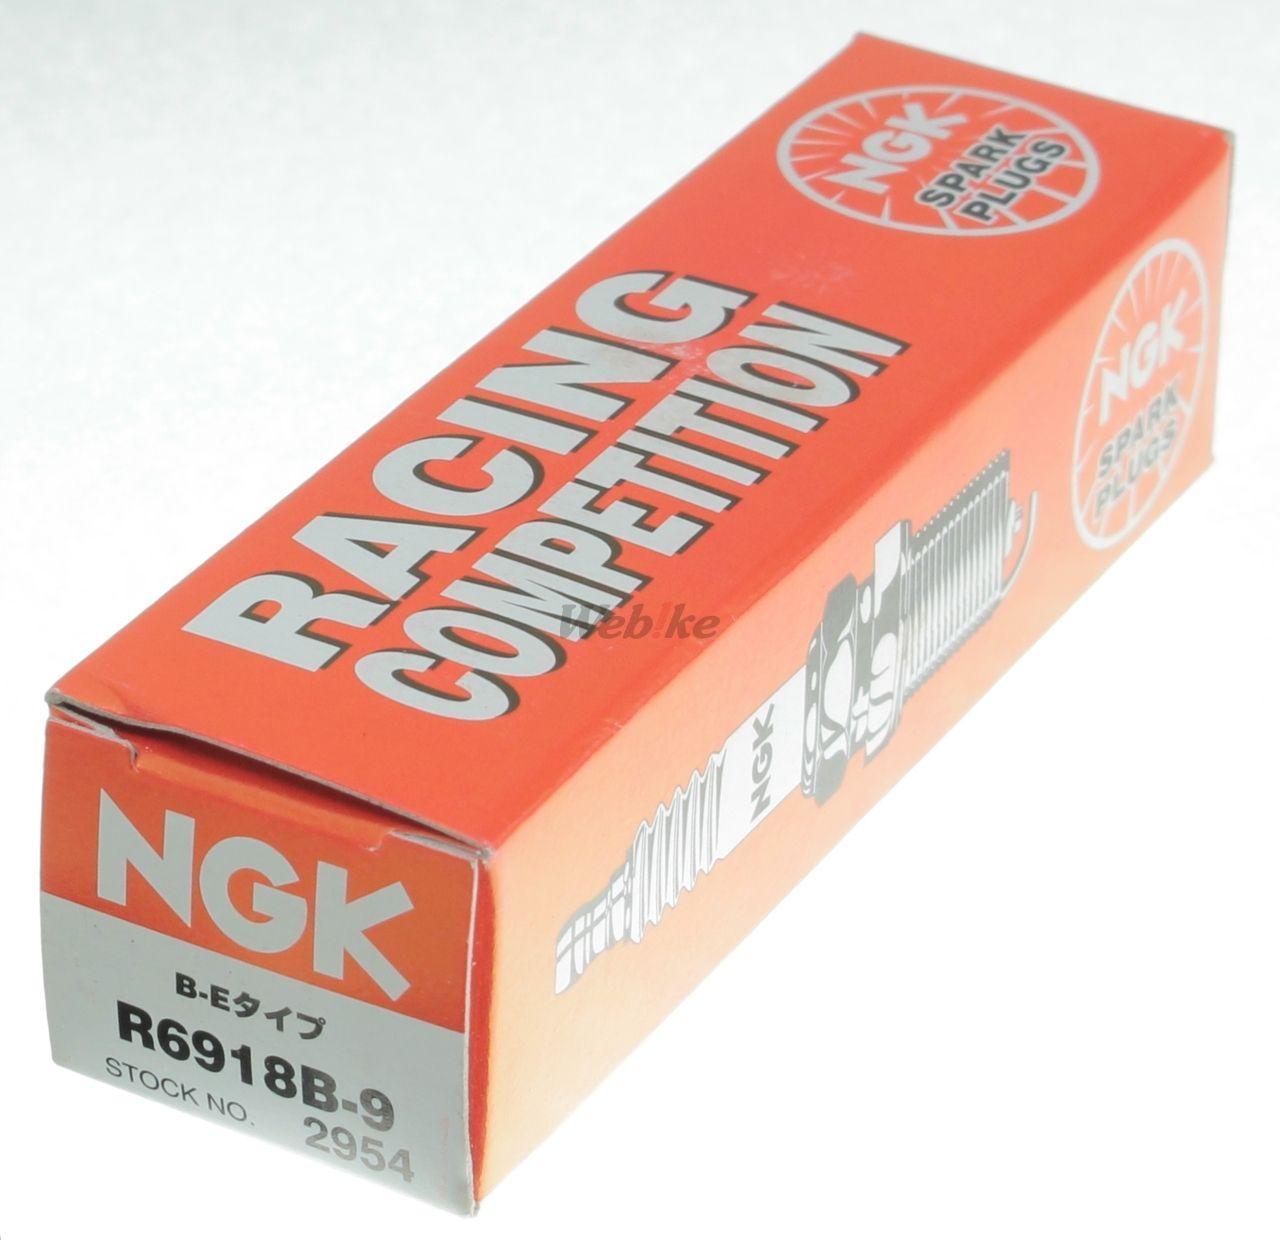 【NGK】競技型 火星塞 R6918B-9 2954 - 「Webike-摩托百貨」